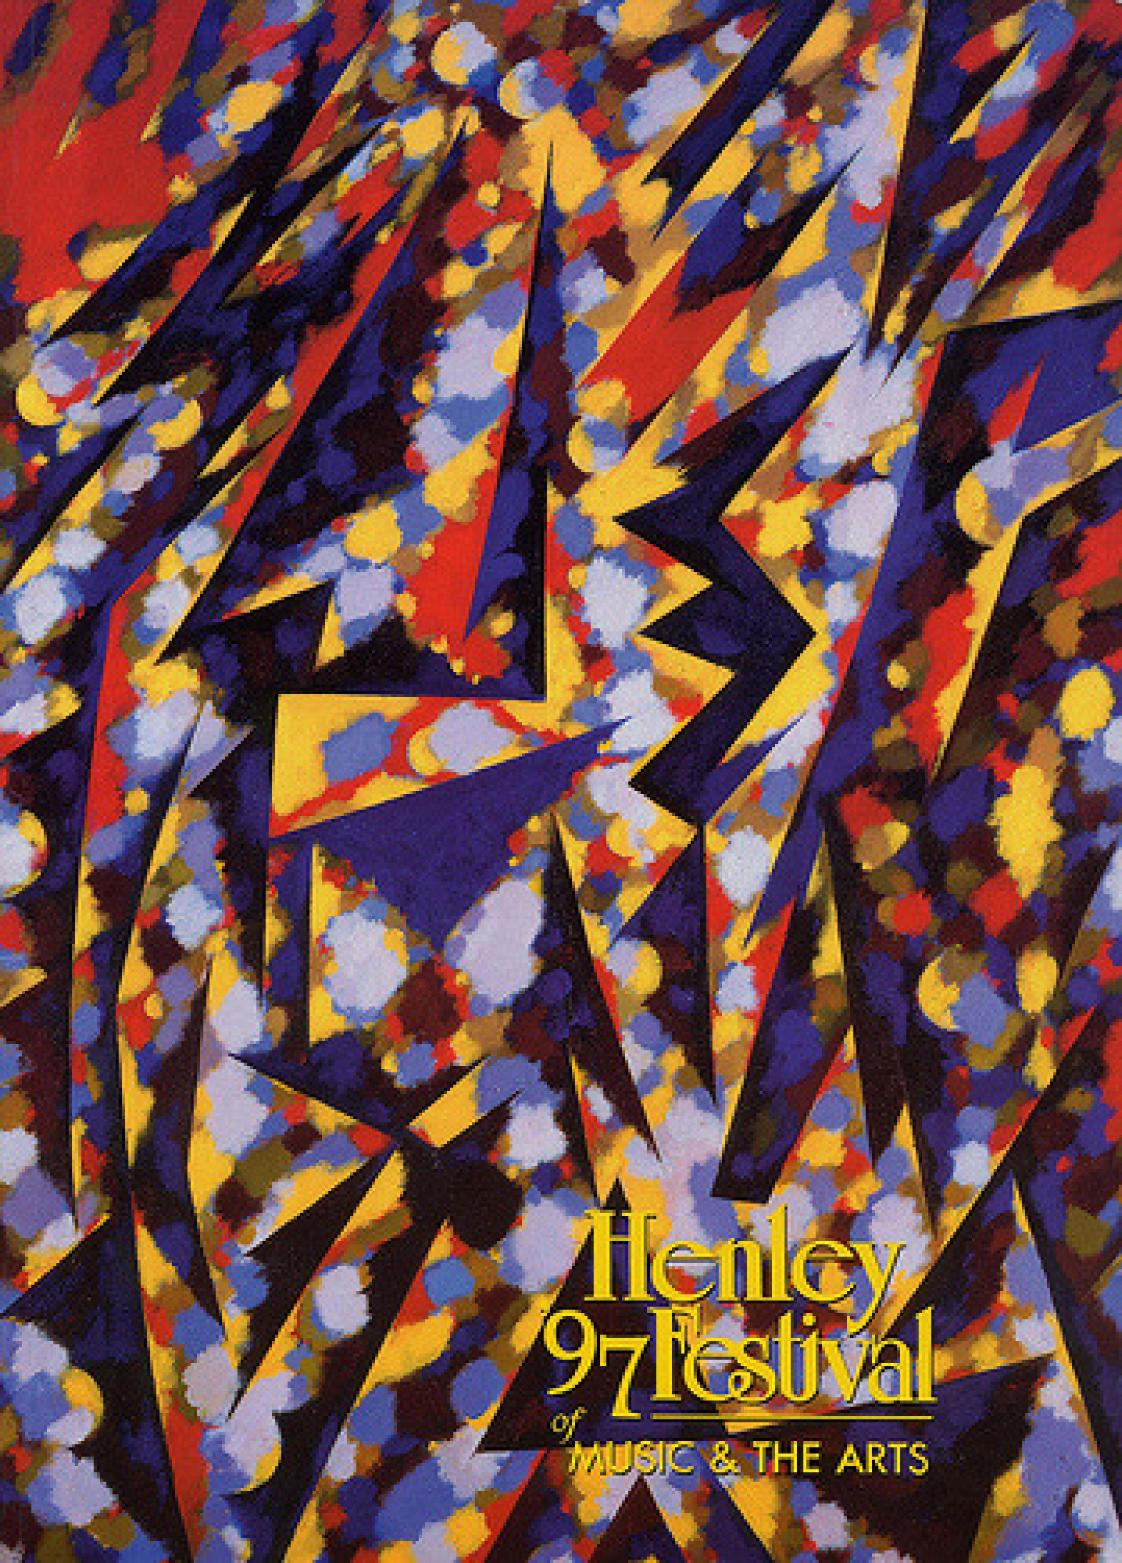 henley-1 2.jpg